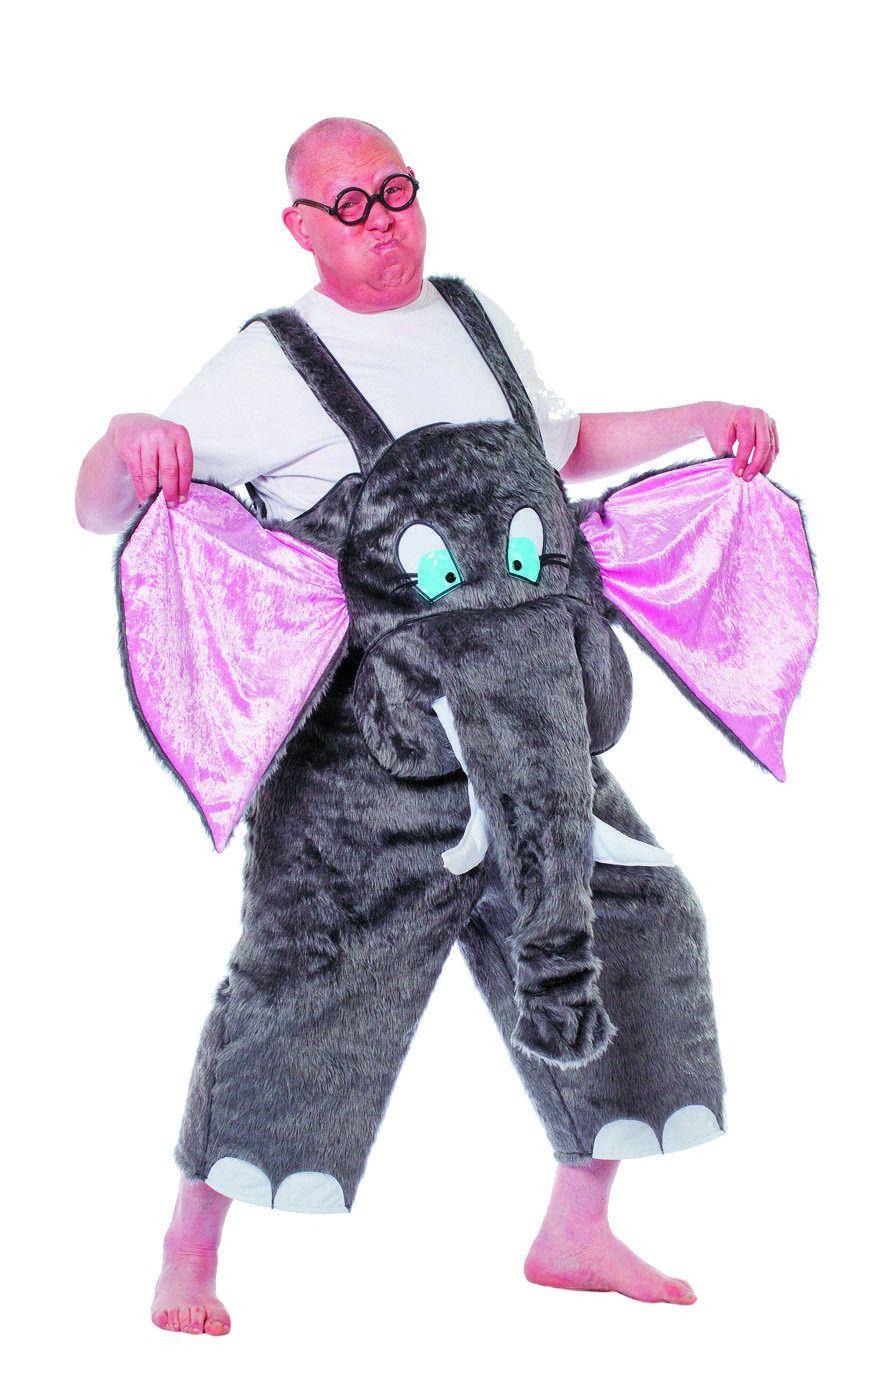 Beestachtig Grappige Latzhose Olifant Man Kostuum